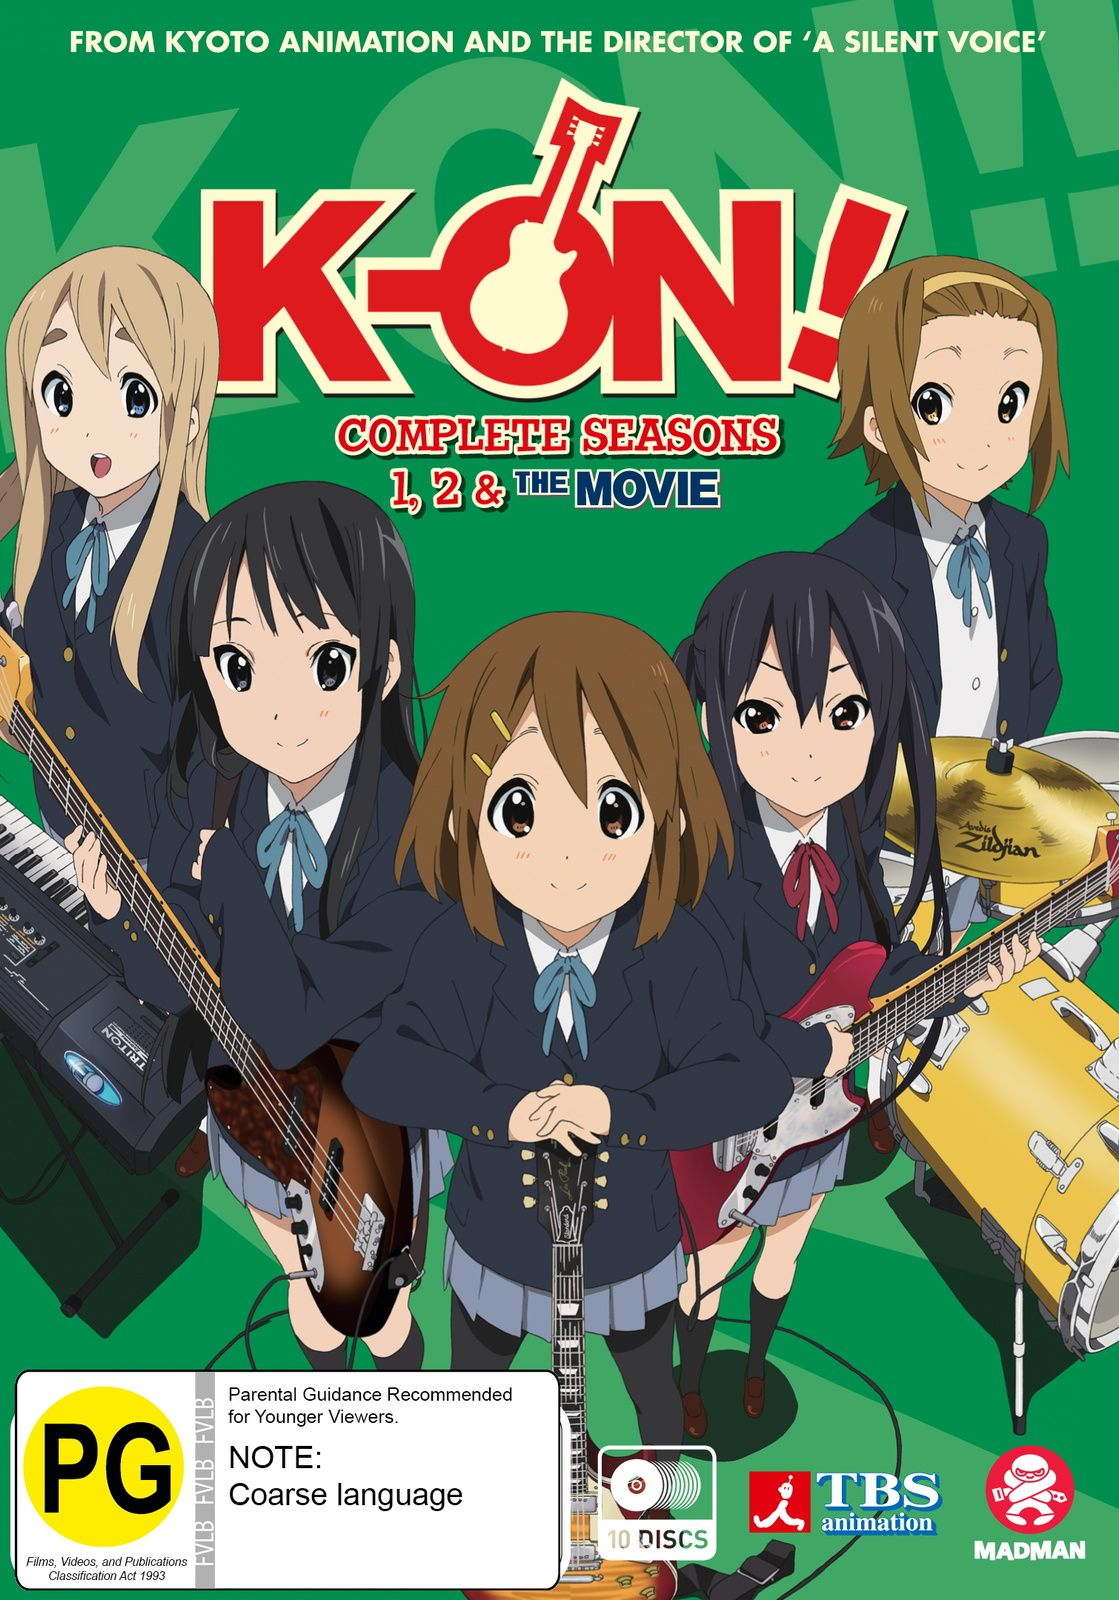 Kon! Ultimate Collection (Season 1, 2 & Movie) DVD in